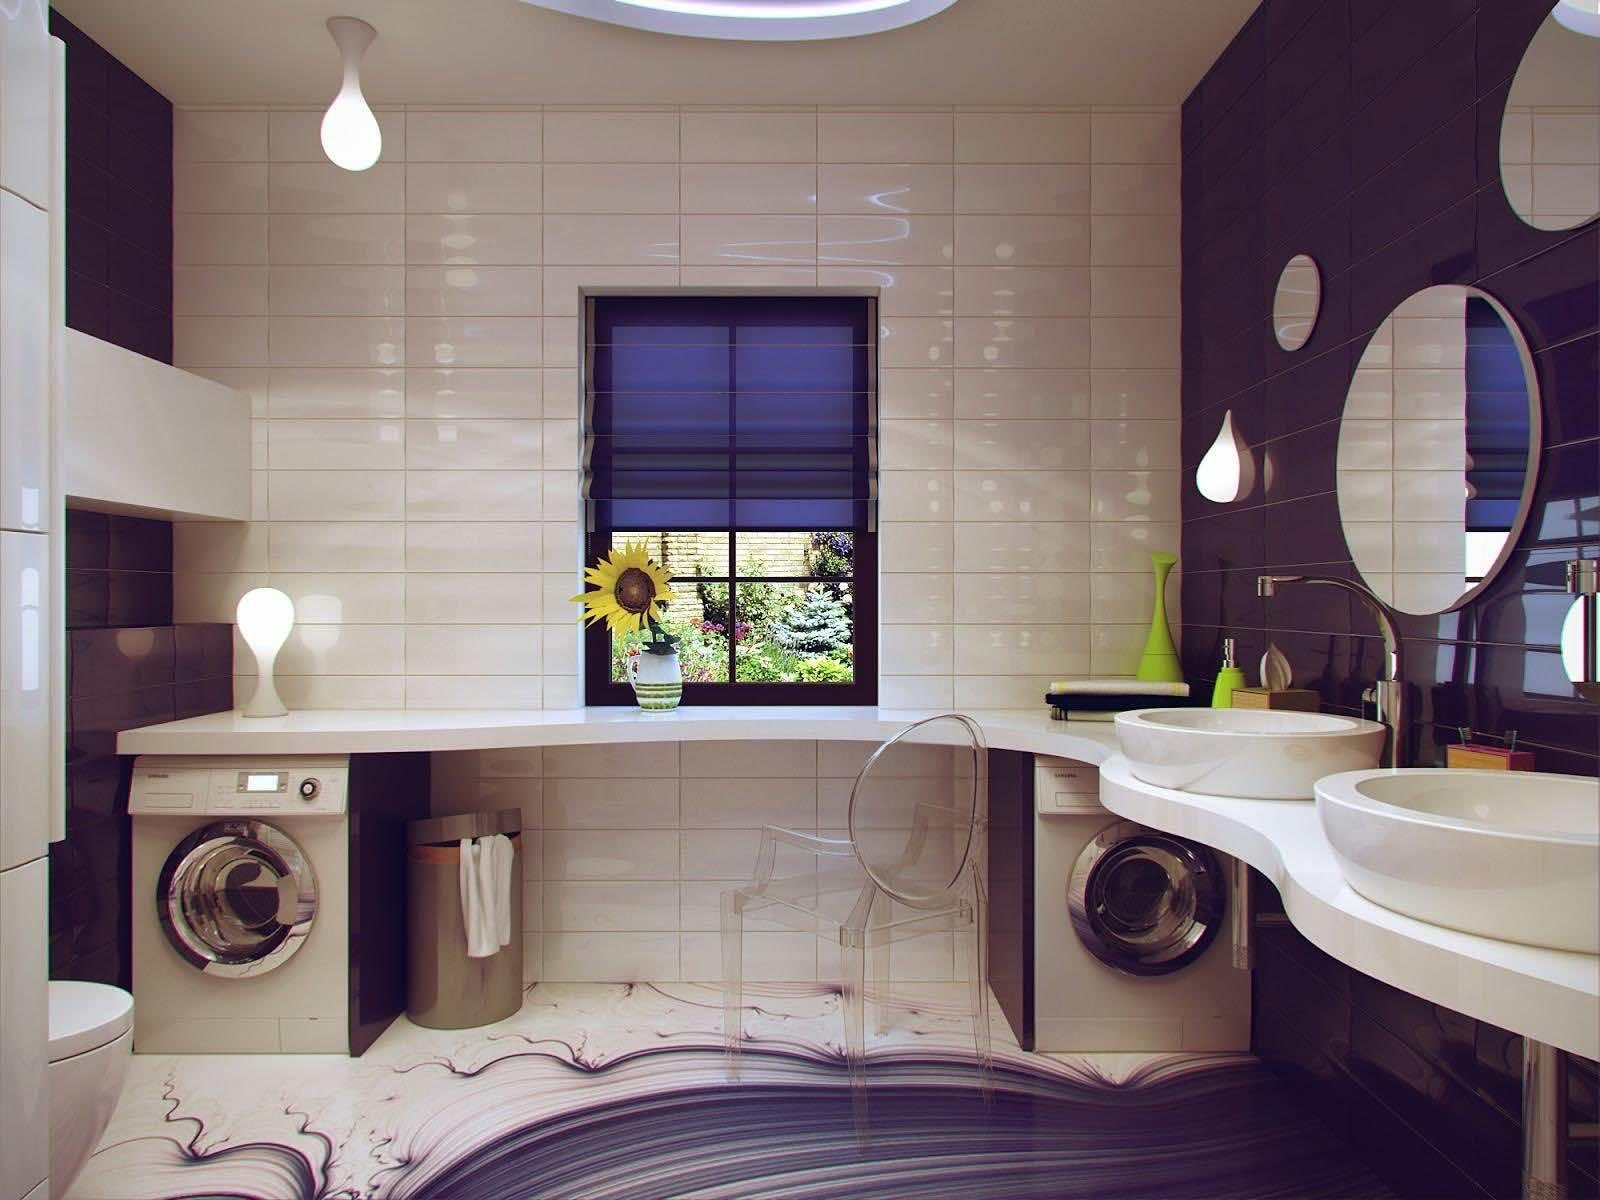 25 Bathroom Design Ideas In Pictures on Bathroom Apartment Ideas  id=93340